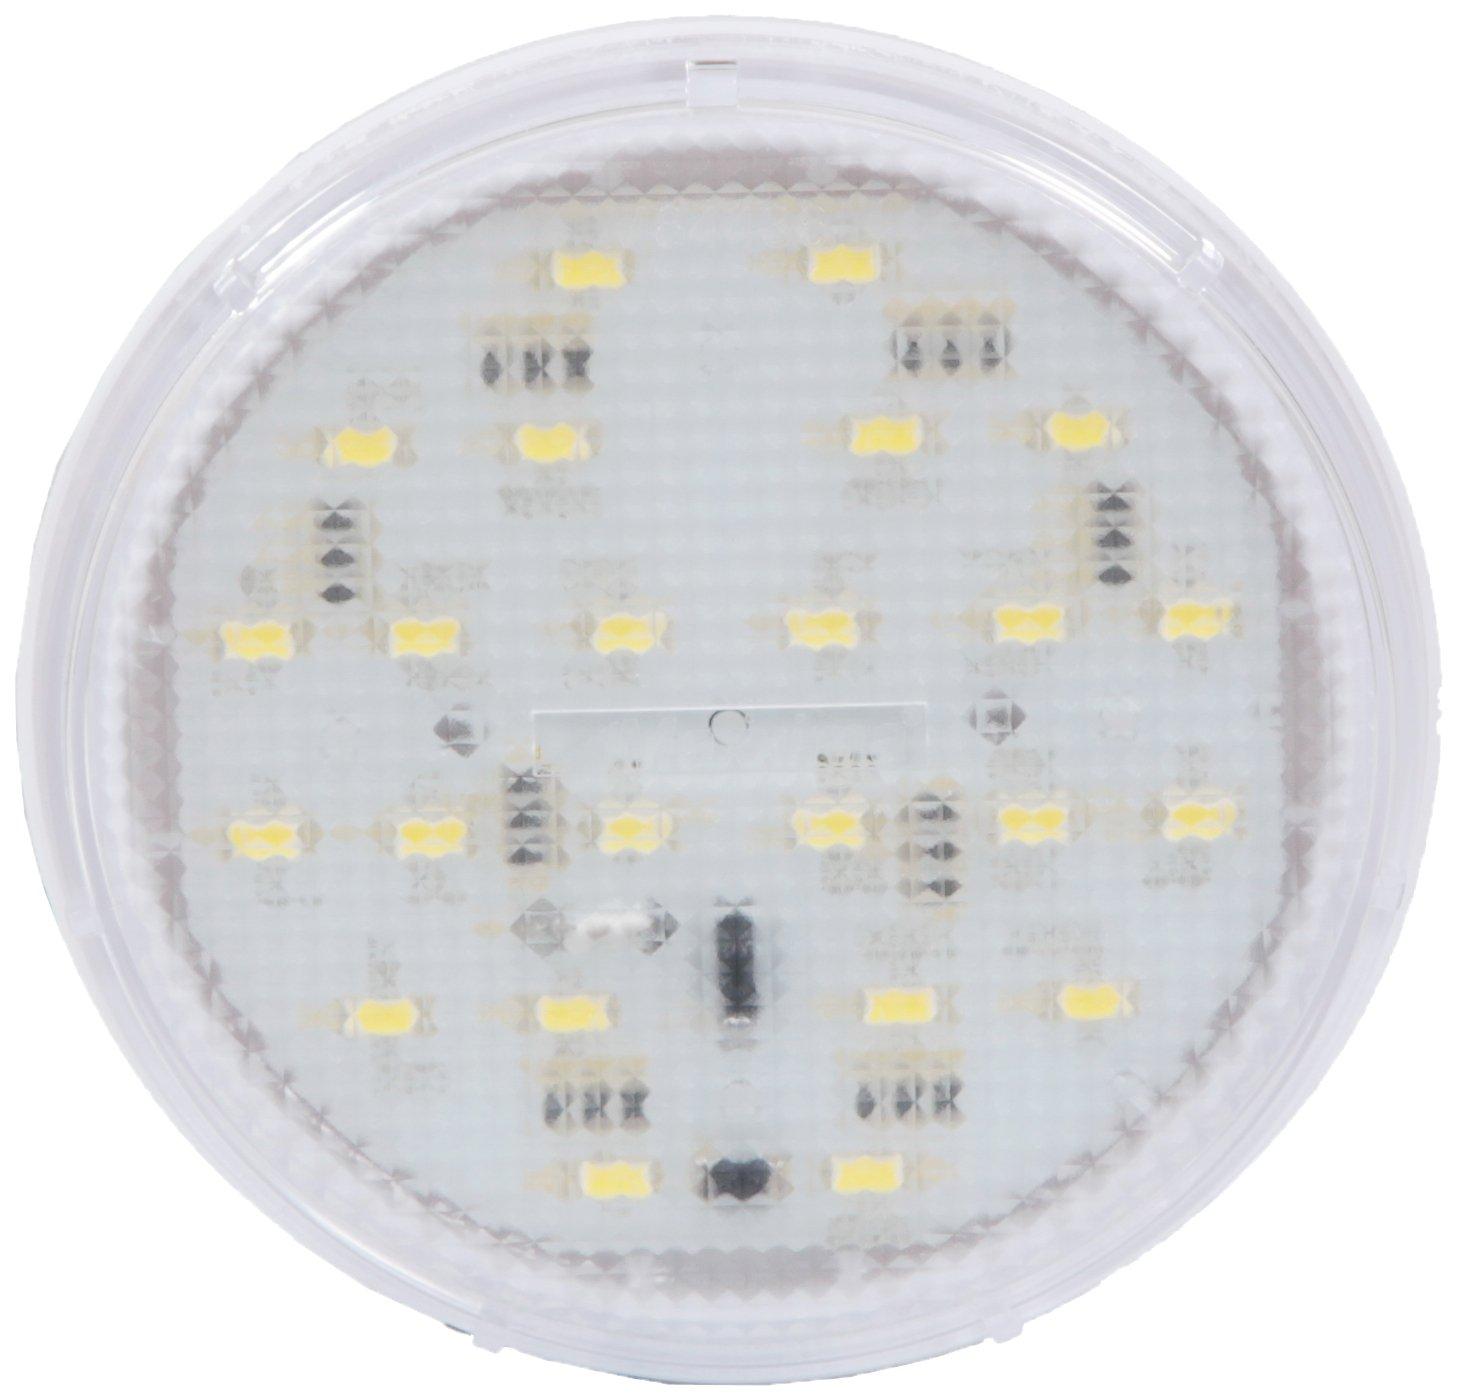 Maxxima M84436 24 LED White 4'' Thin Profile Interior Dome Light 450 Lumens